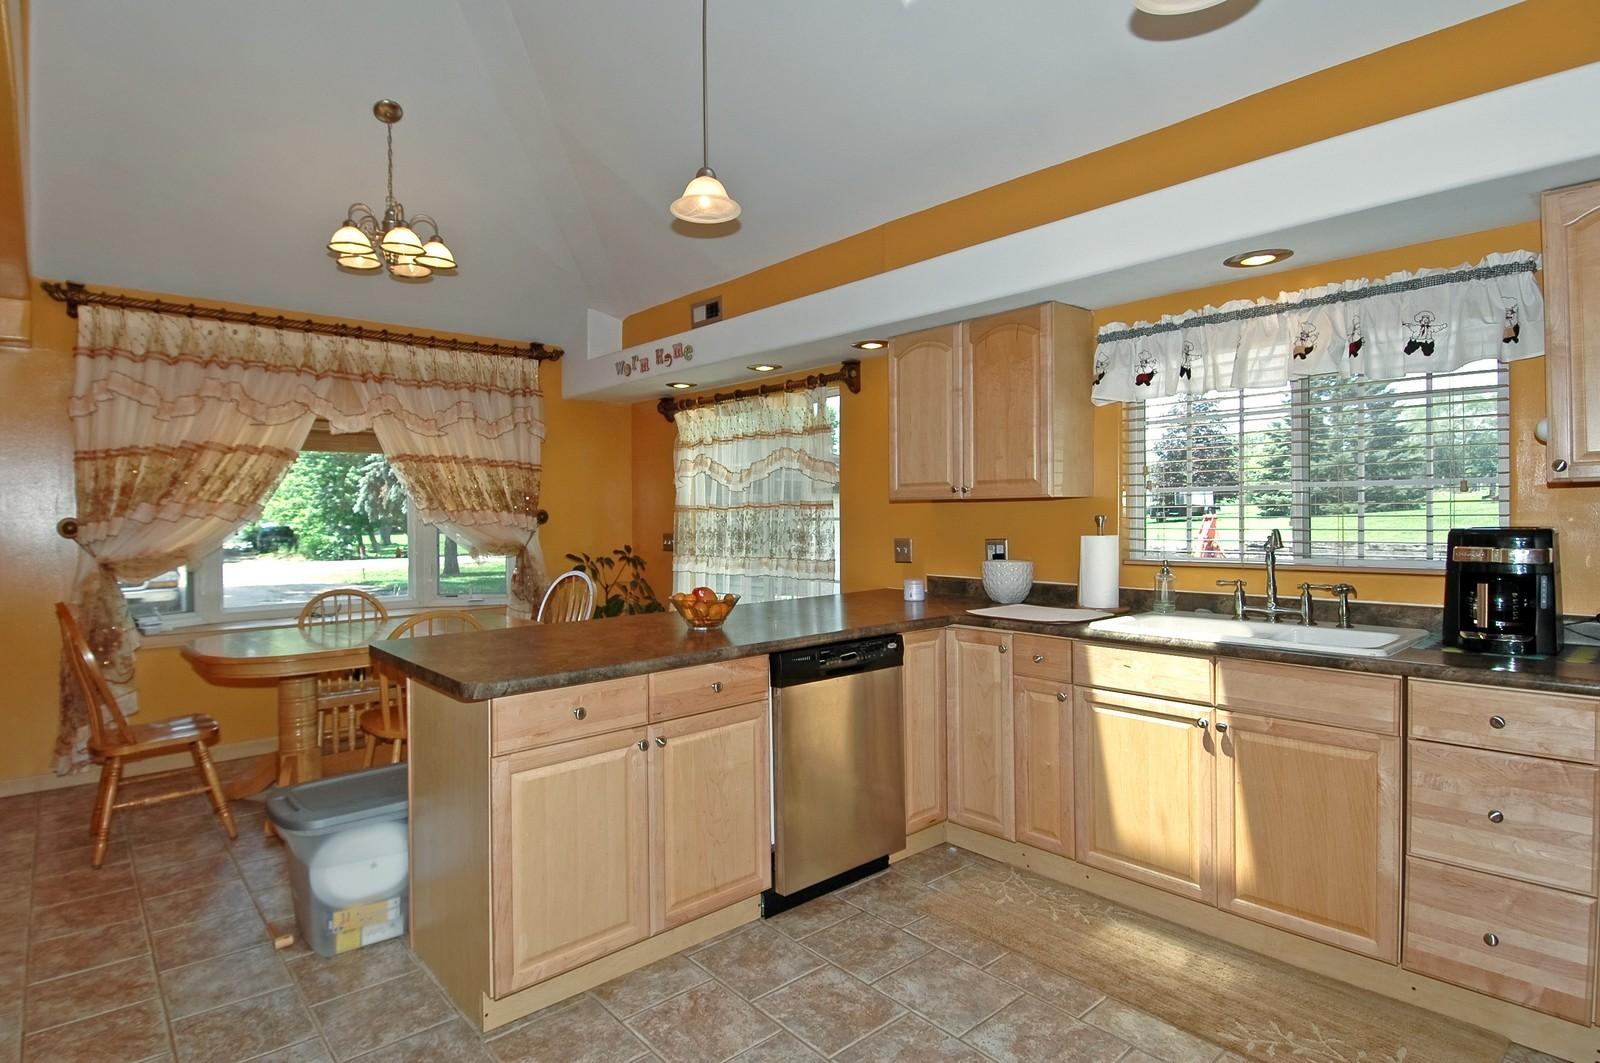 Real Estate Photography - 10N875 Belmont St, Elgin, IL, 60120 - Kitchen